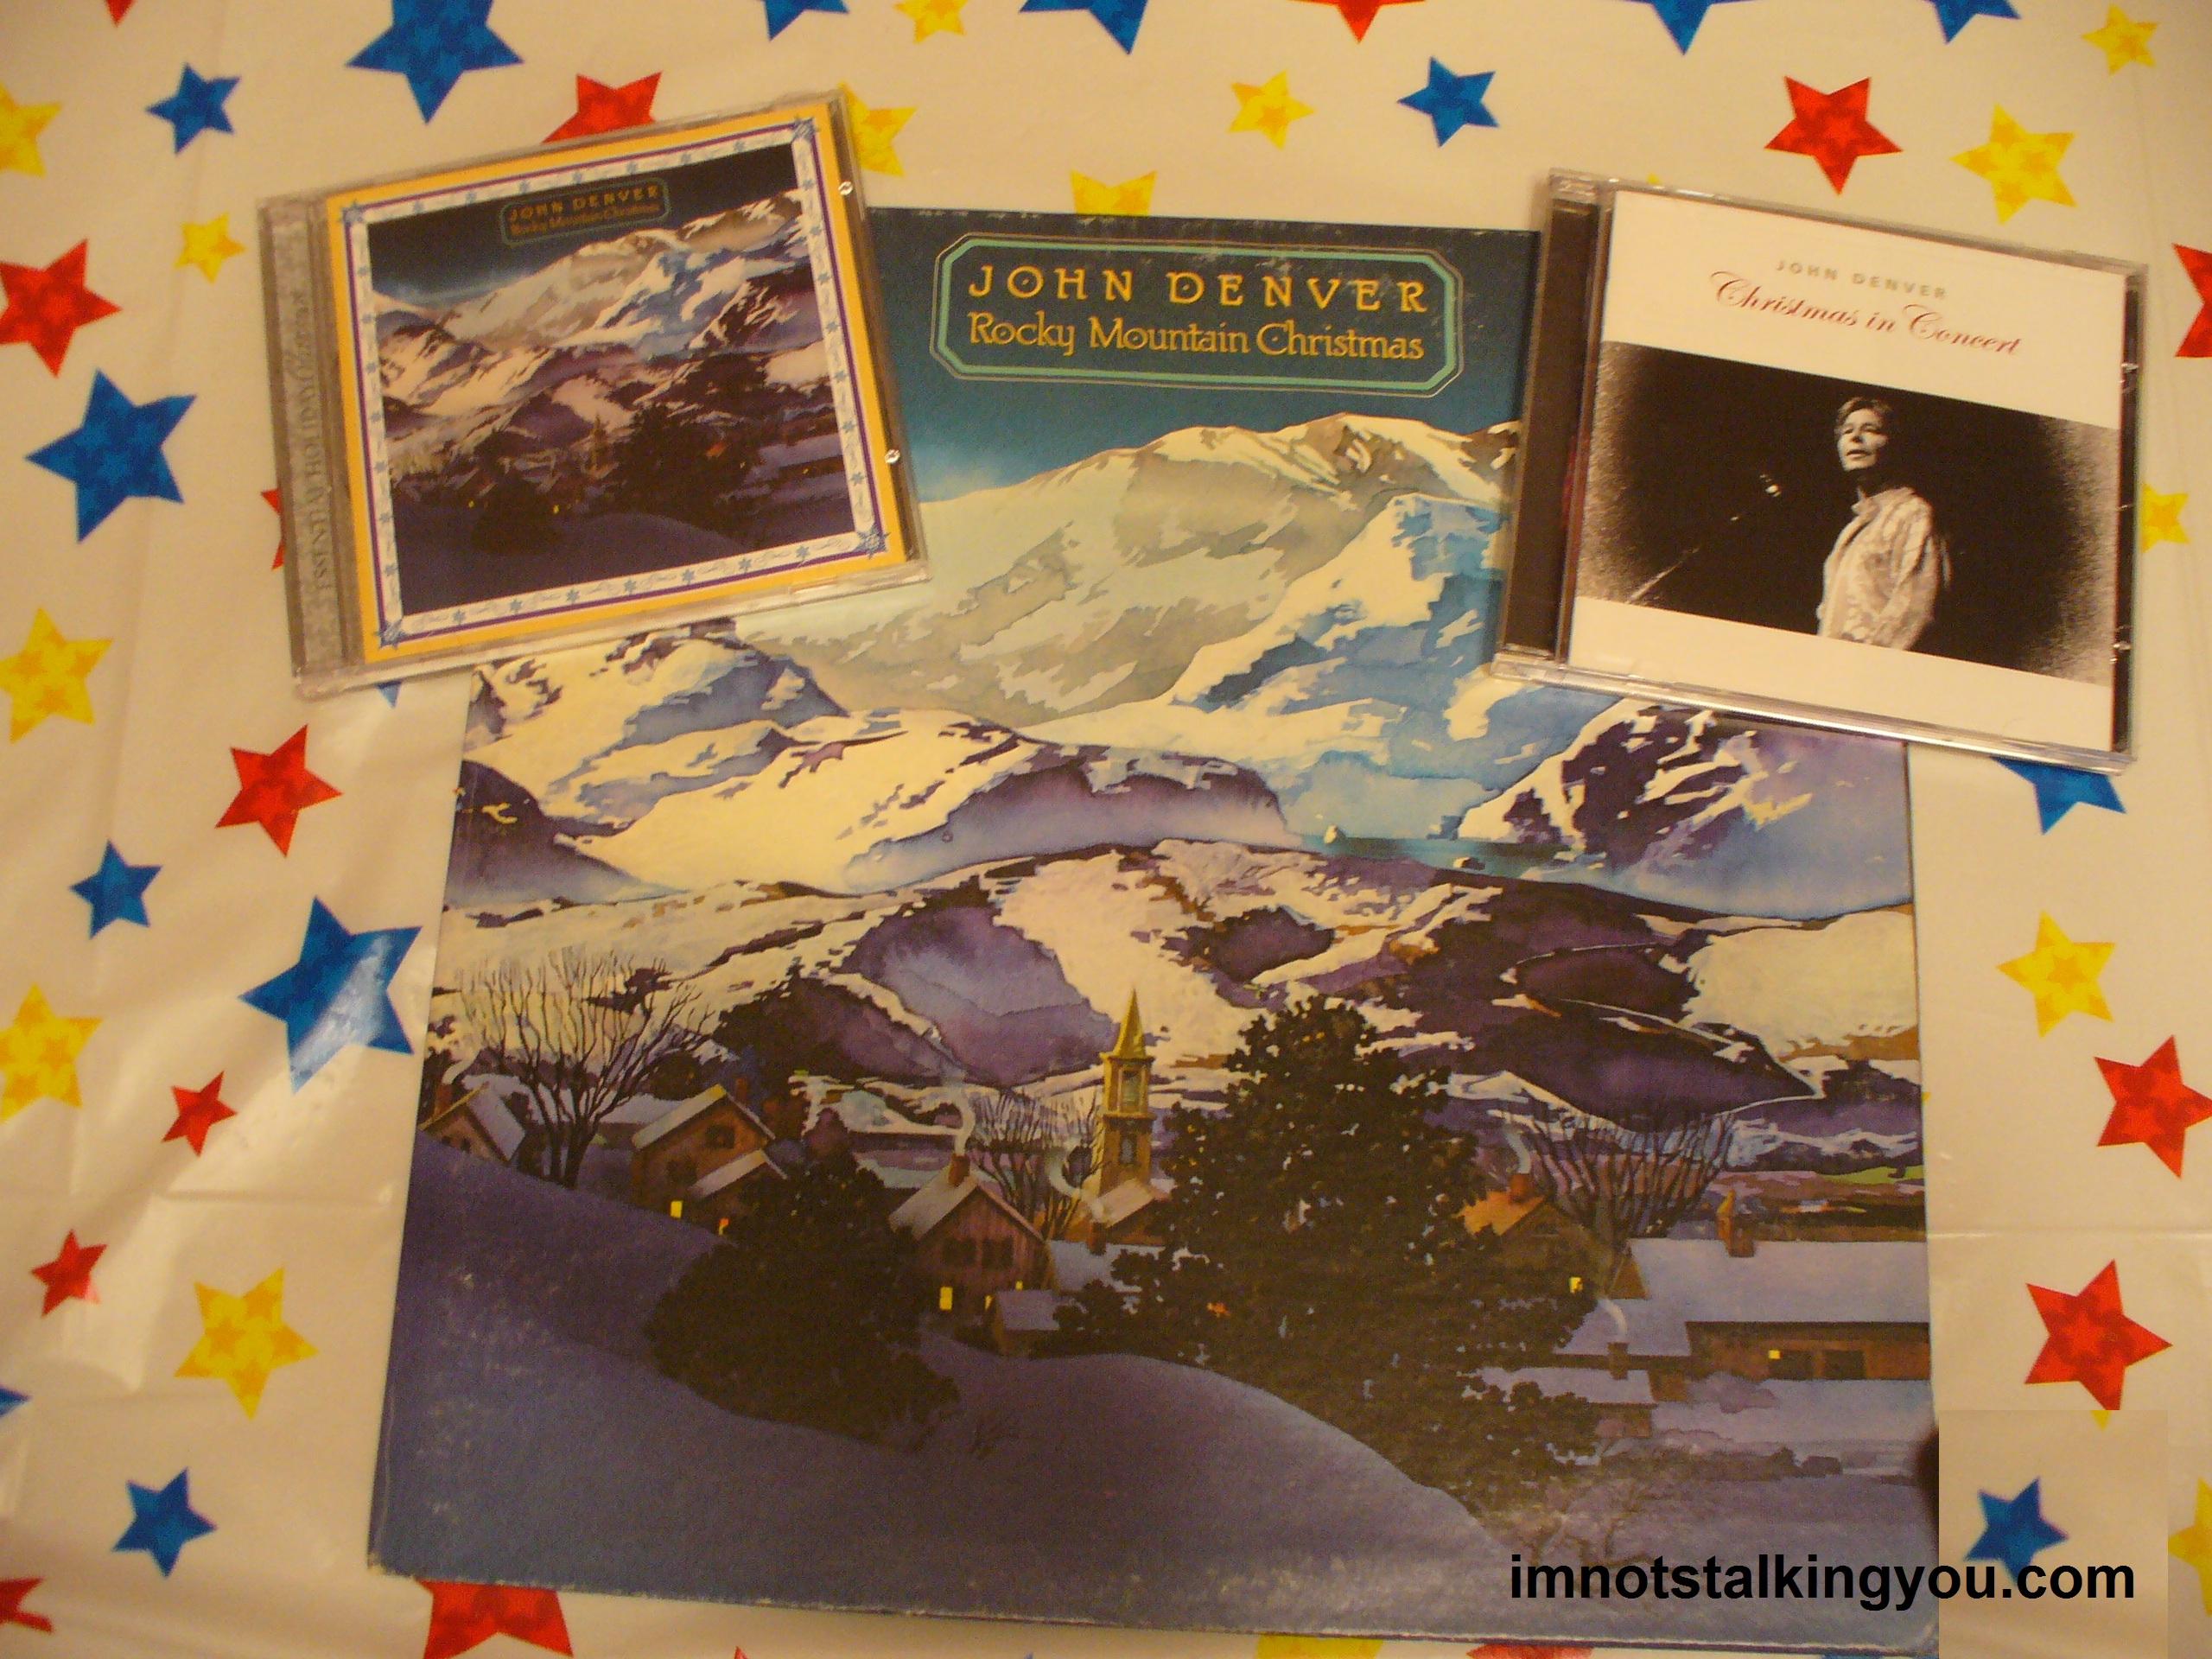 JOHN DENVER-rocky mountain xmas | I\'m not stalking you.